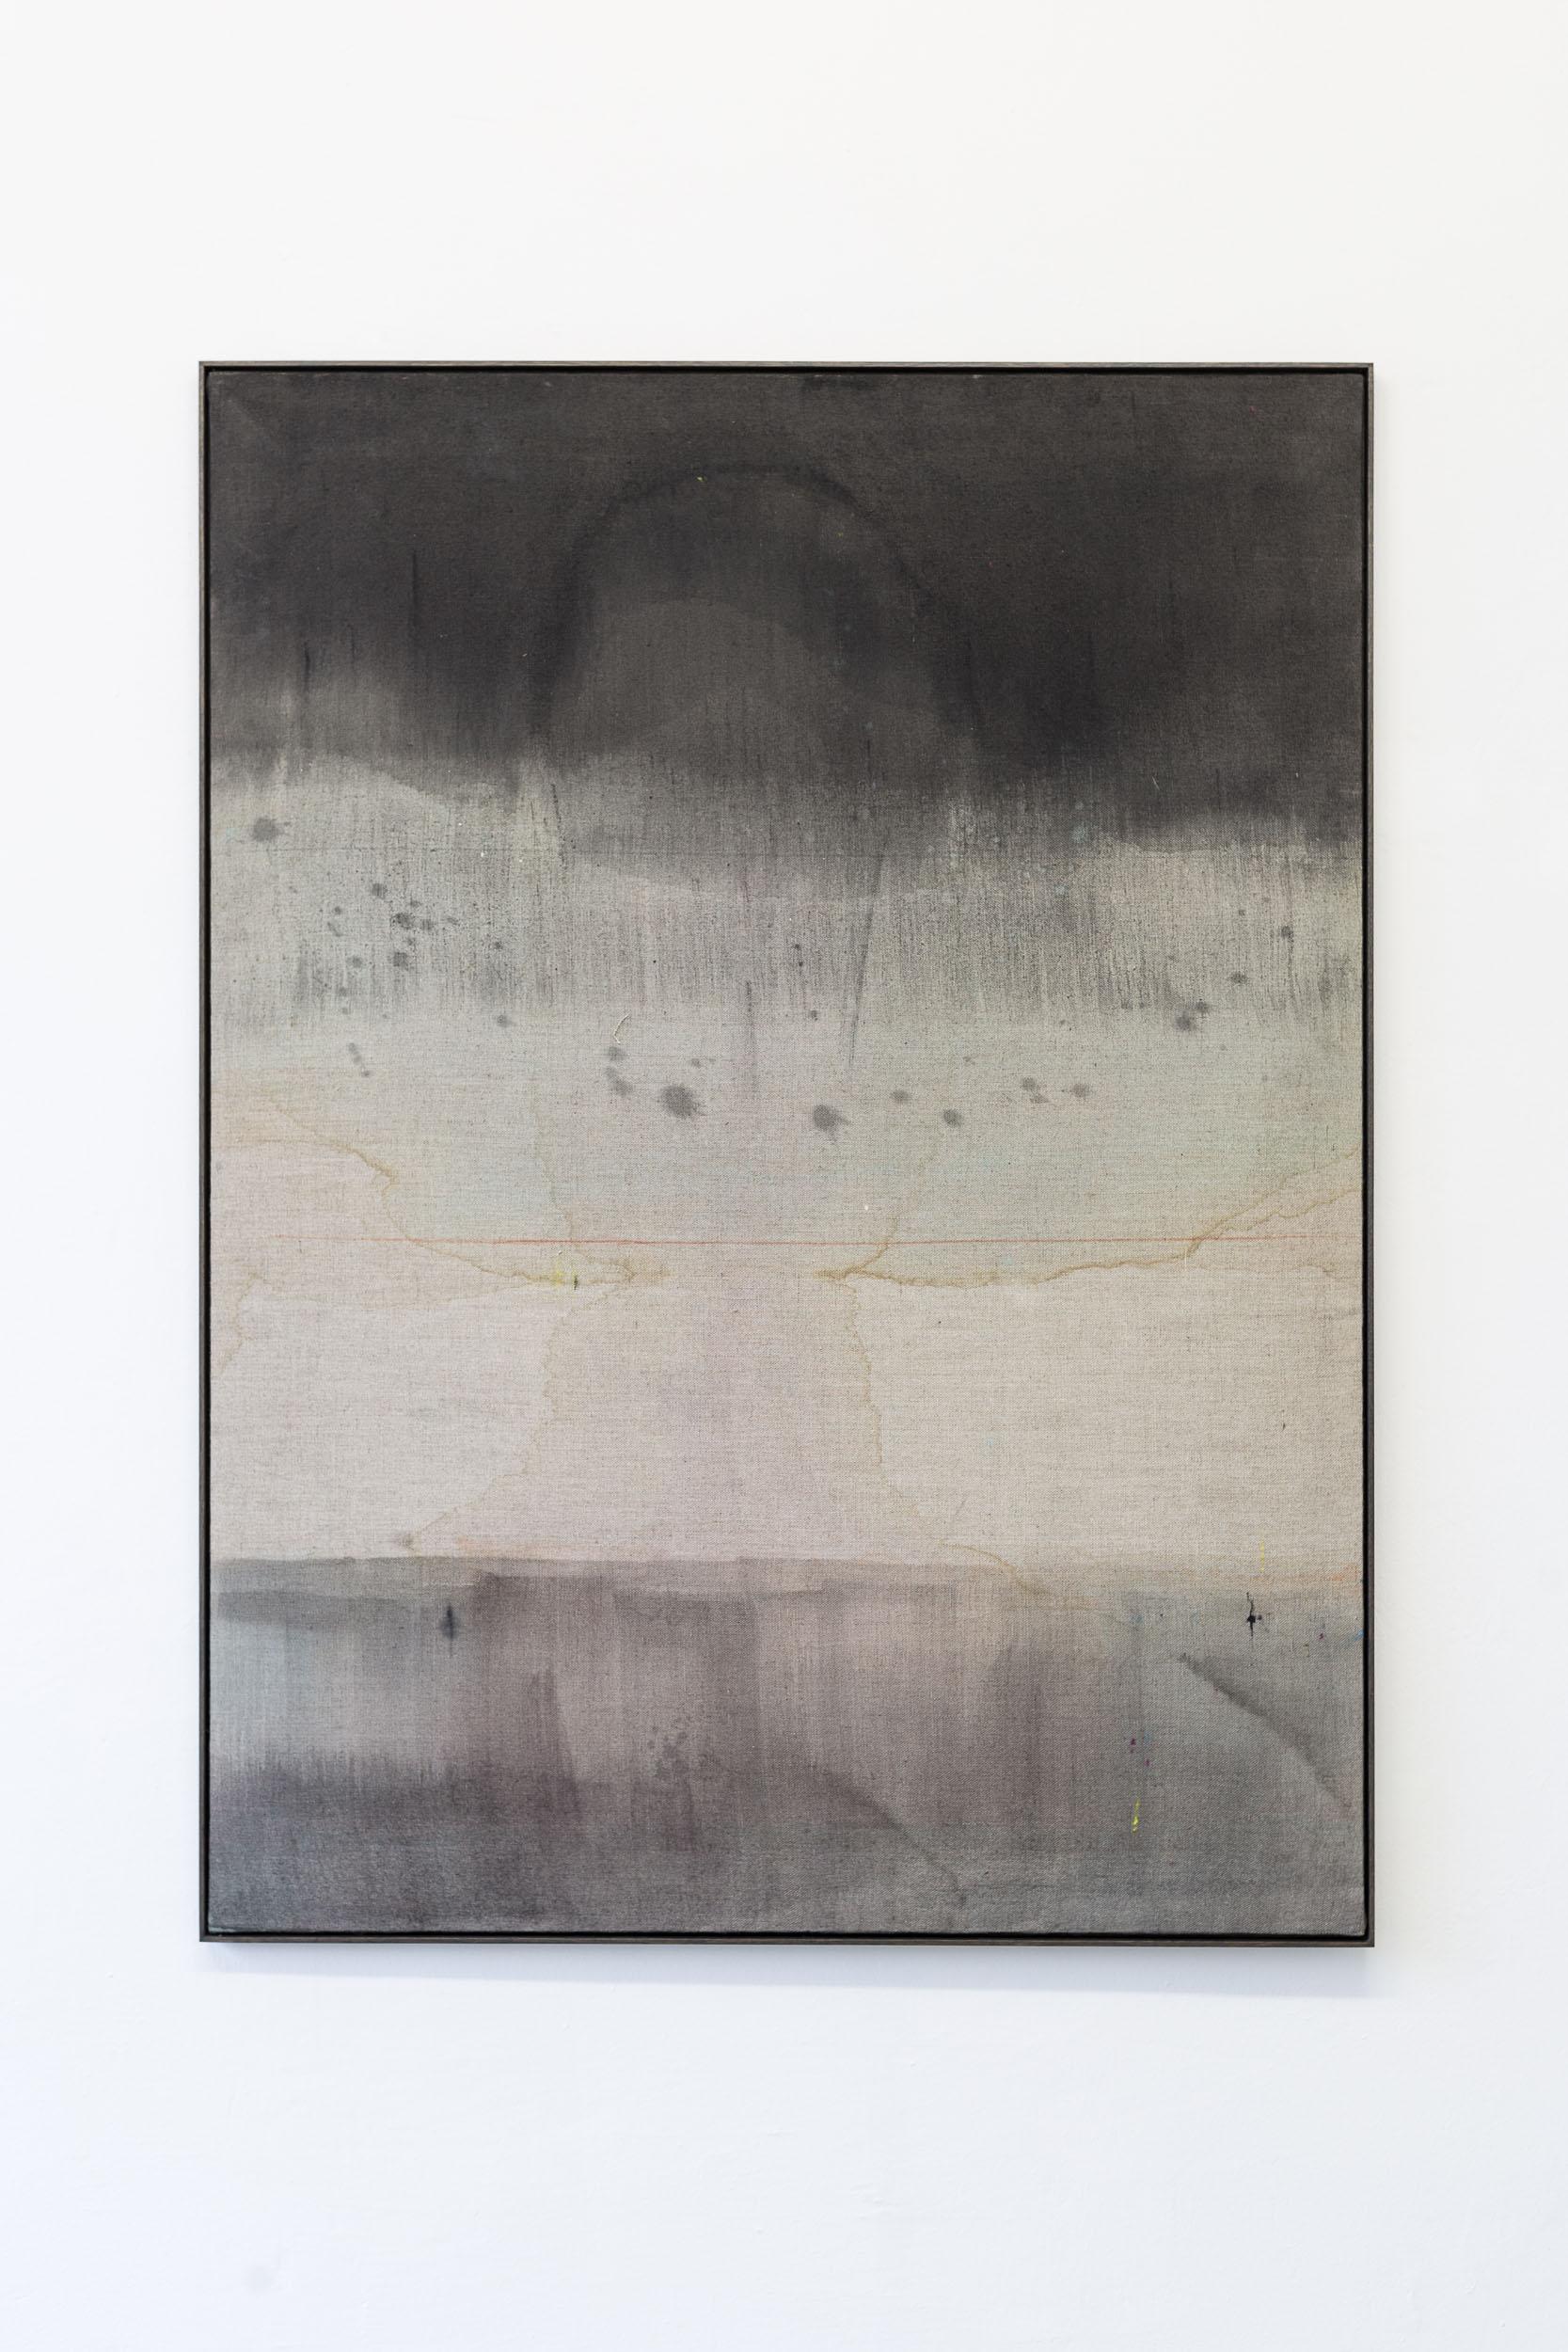 Kirstine Roepstorff,  Illustration # , 2017,   Watering:Pigment, cloth, linen  ,   102 x 137.5 cm   Photo: Kilian Bannwart